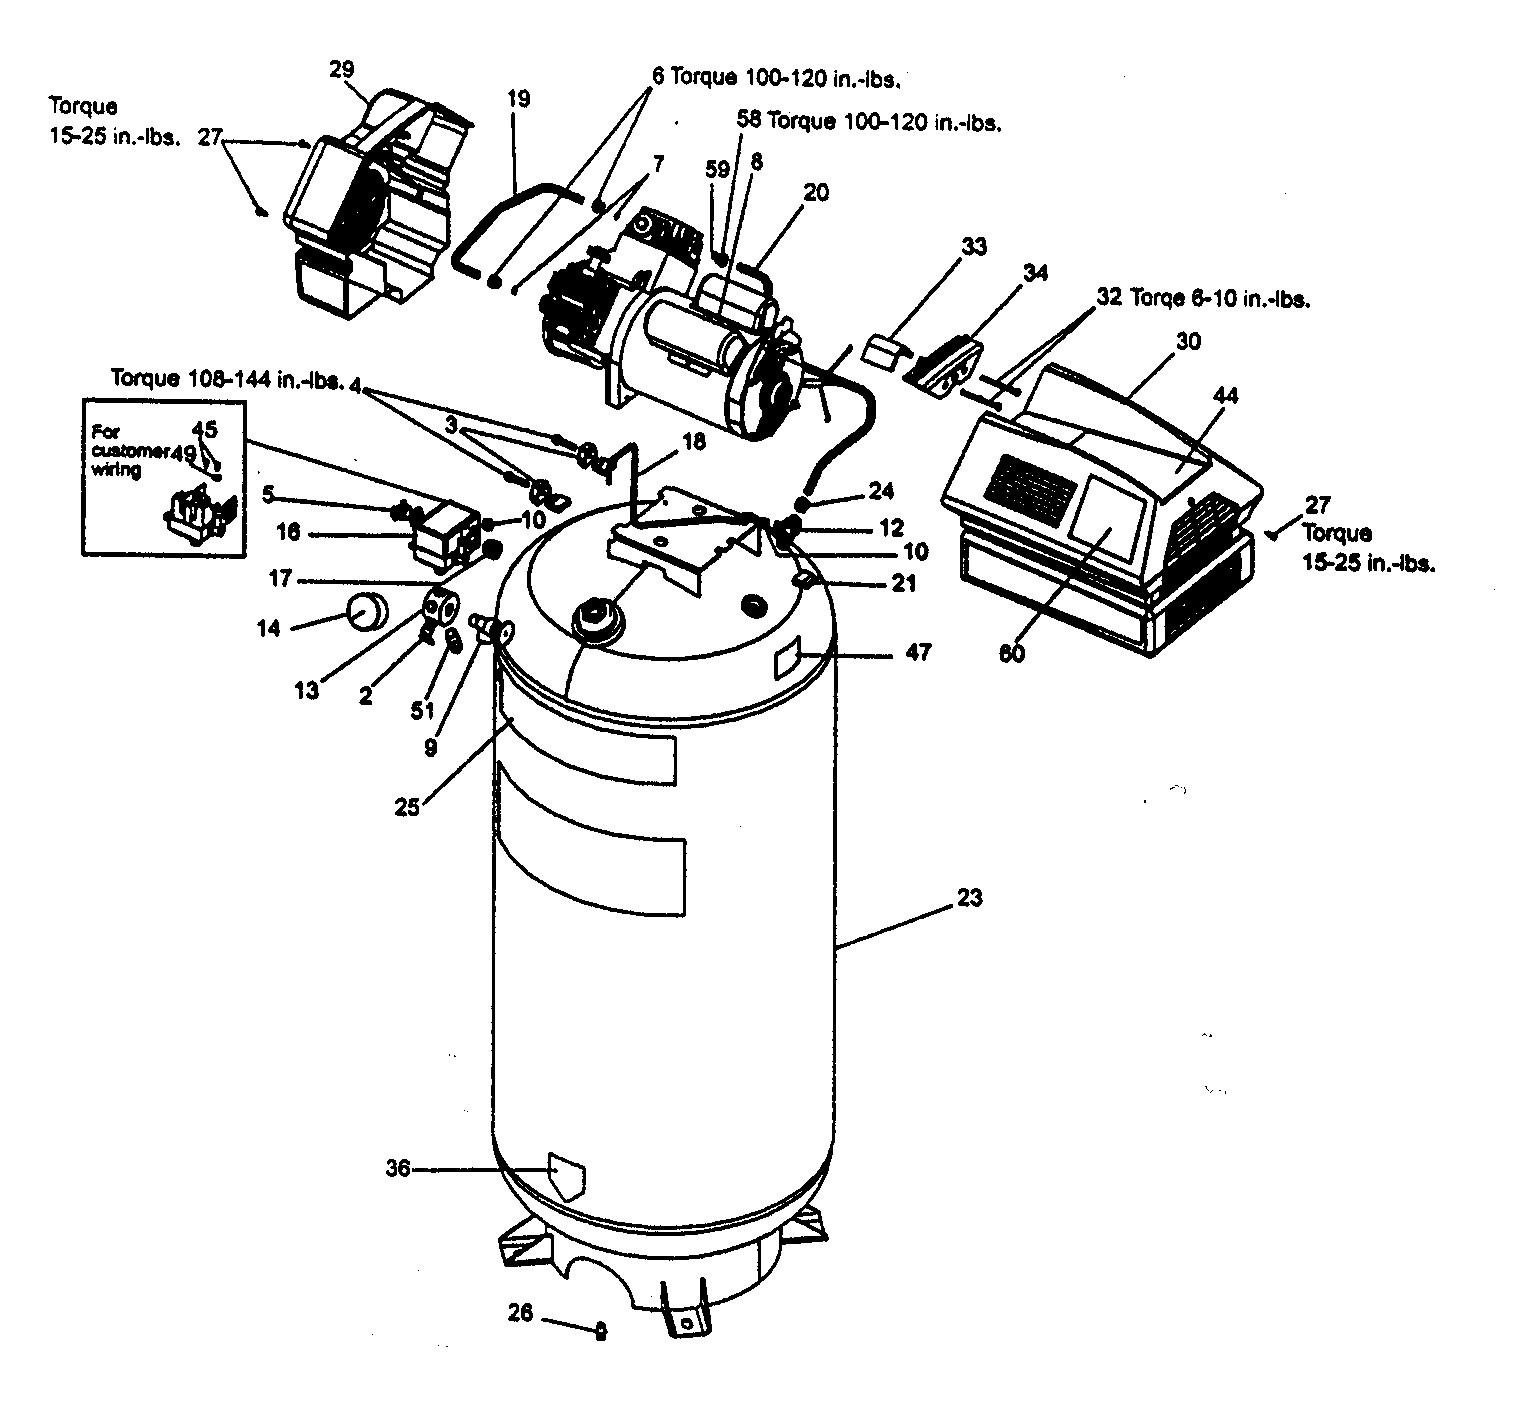 Craftsman Air Compressor Parts Diagram Craftsman 919 Parts Master tool Repair Of Craftsman Air Compressor Parts Diagram